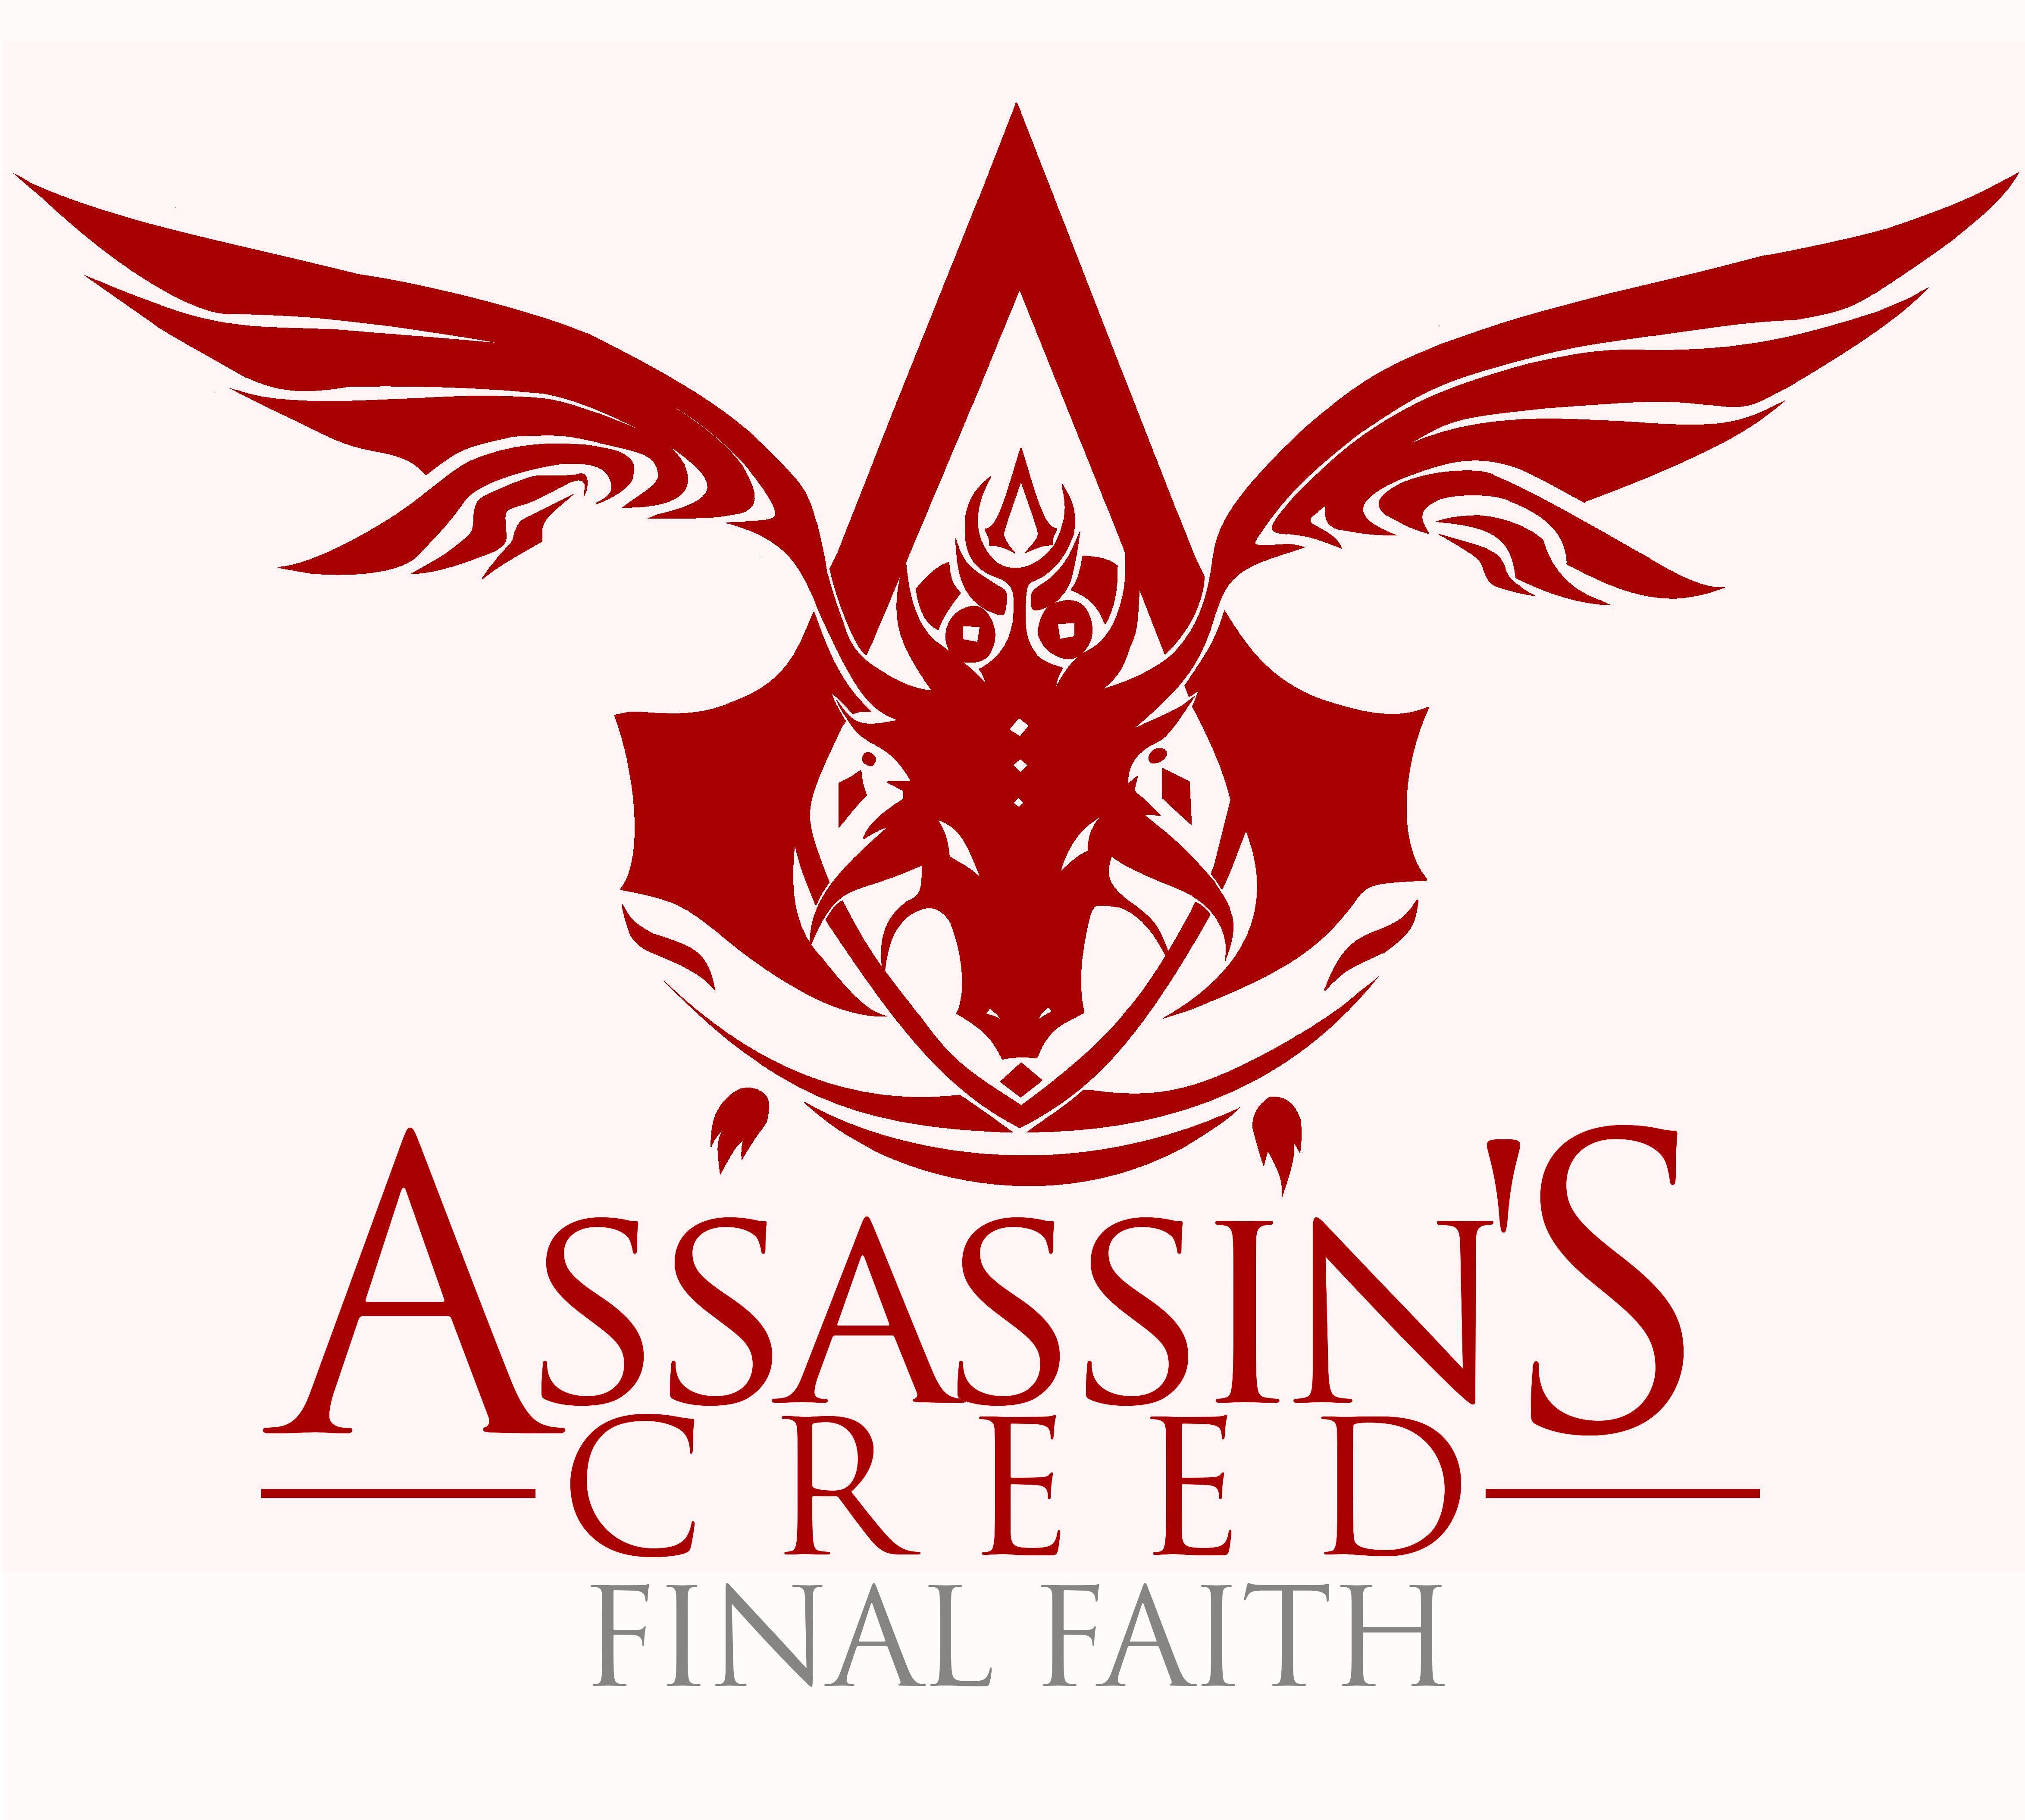 Assassins Creed Final Faith Tribal Symbol By Dirtydirtysam On